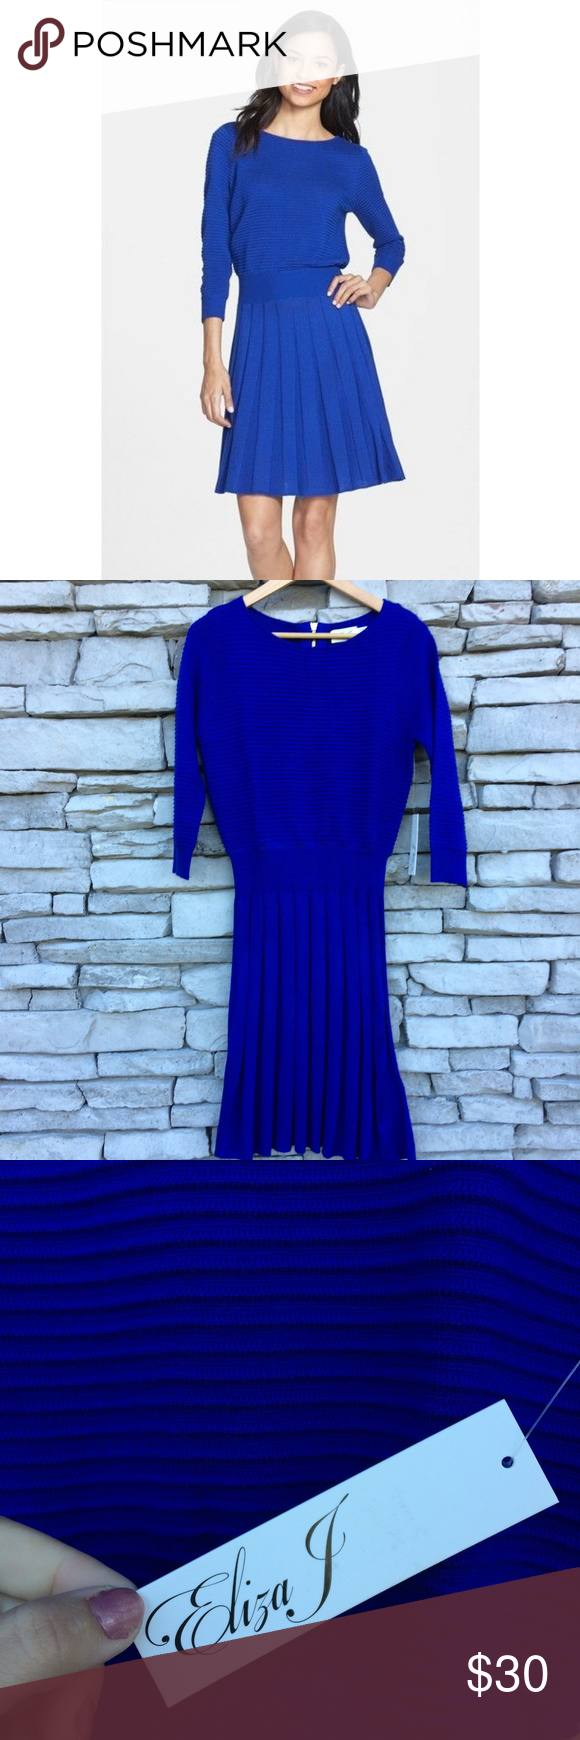 Eliza j small blue blouson pleated sweater dress